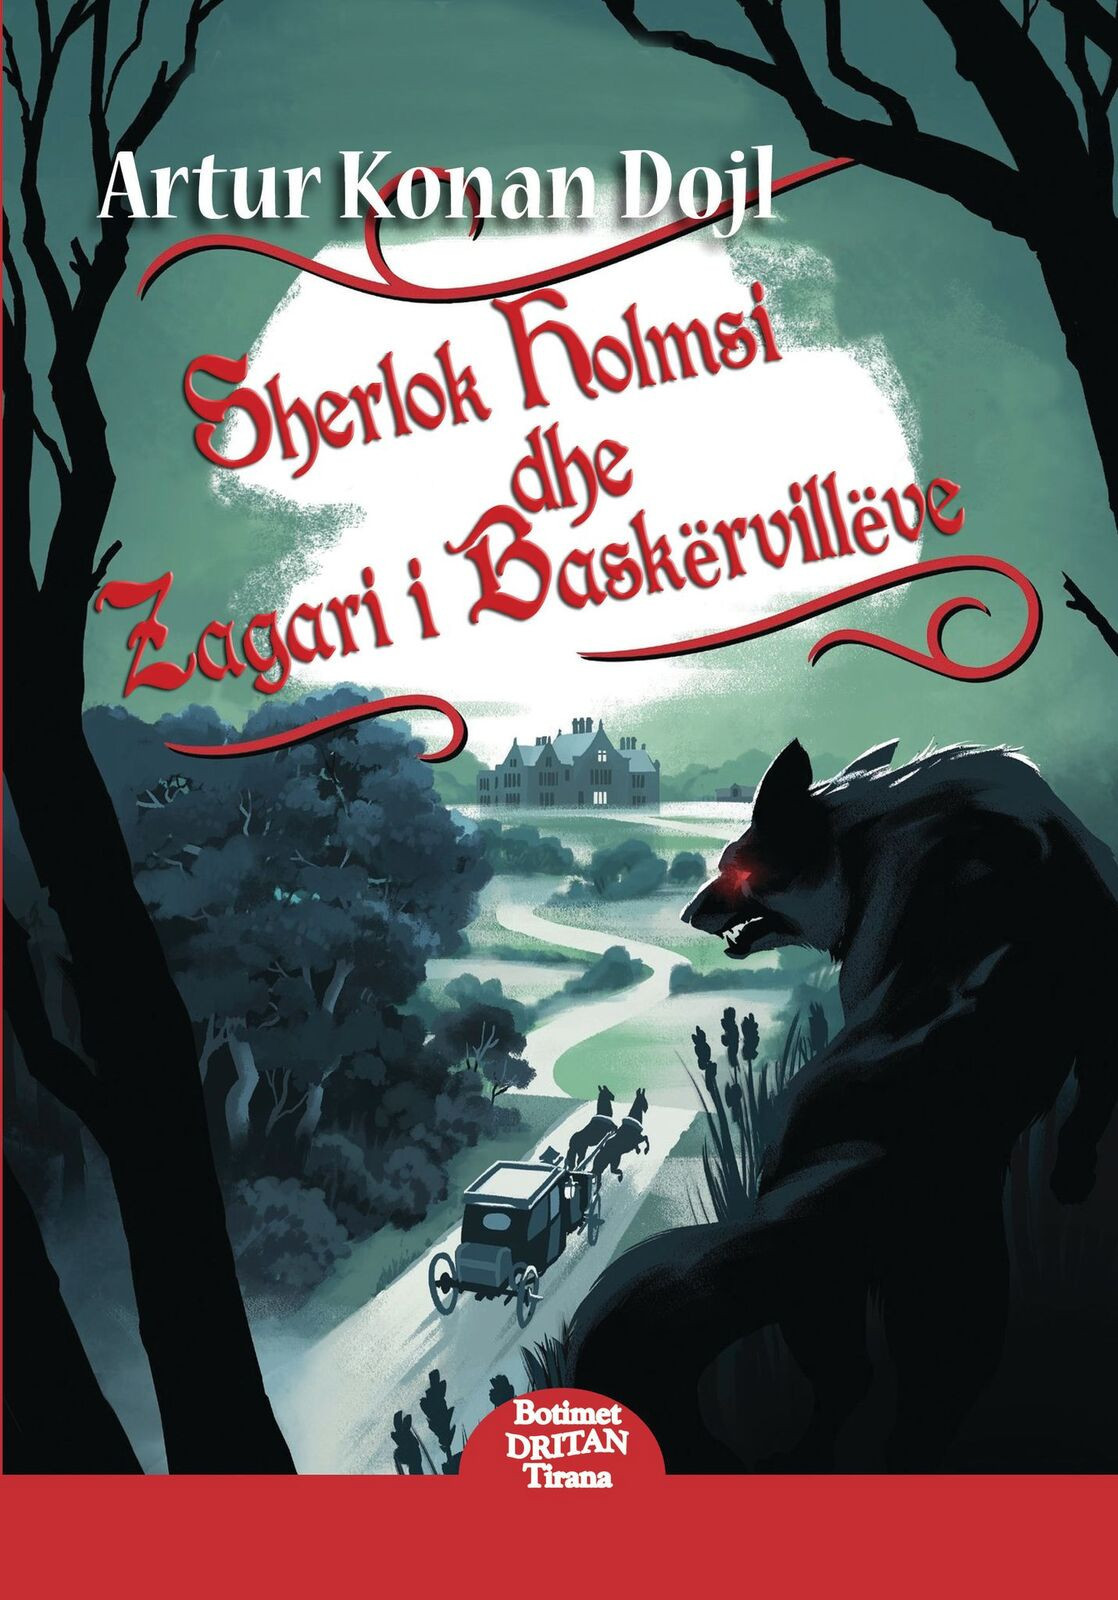 Sherlok Holmsi dhe zagari i Baskervilleve